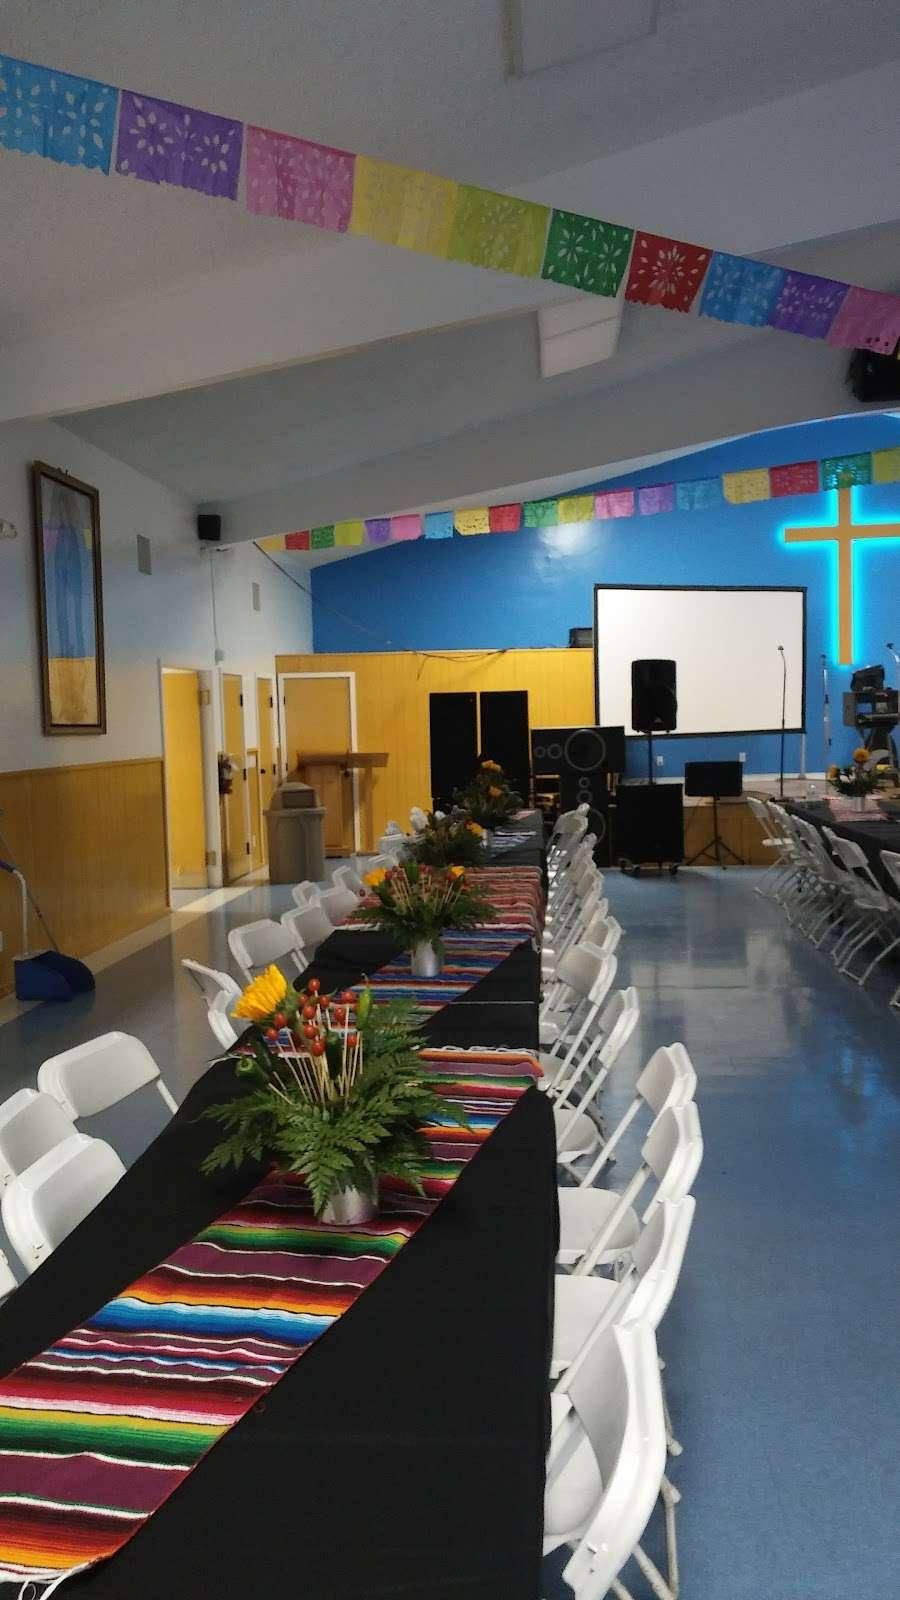 Holy Family Catholic Church - church  | Photo 7 of 10 | Address: 1011 E L St, Wilmington, CA 90744, USA | Phone: (310) 834-6333